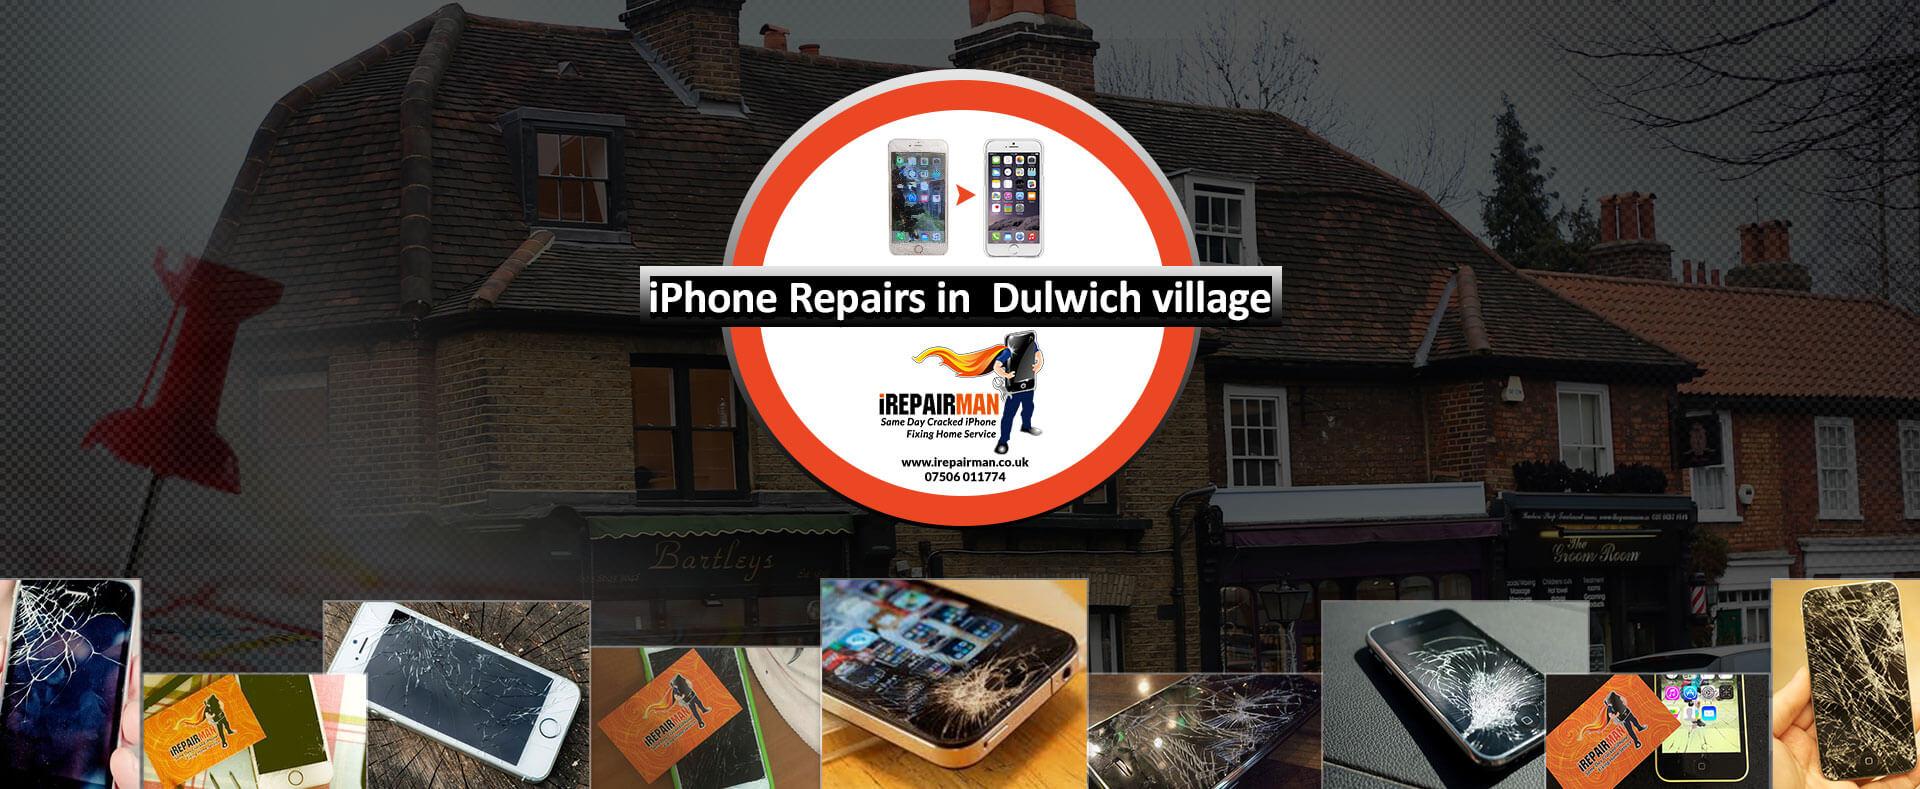 iphone-repairs-in-dulwich-village